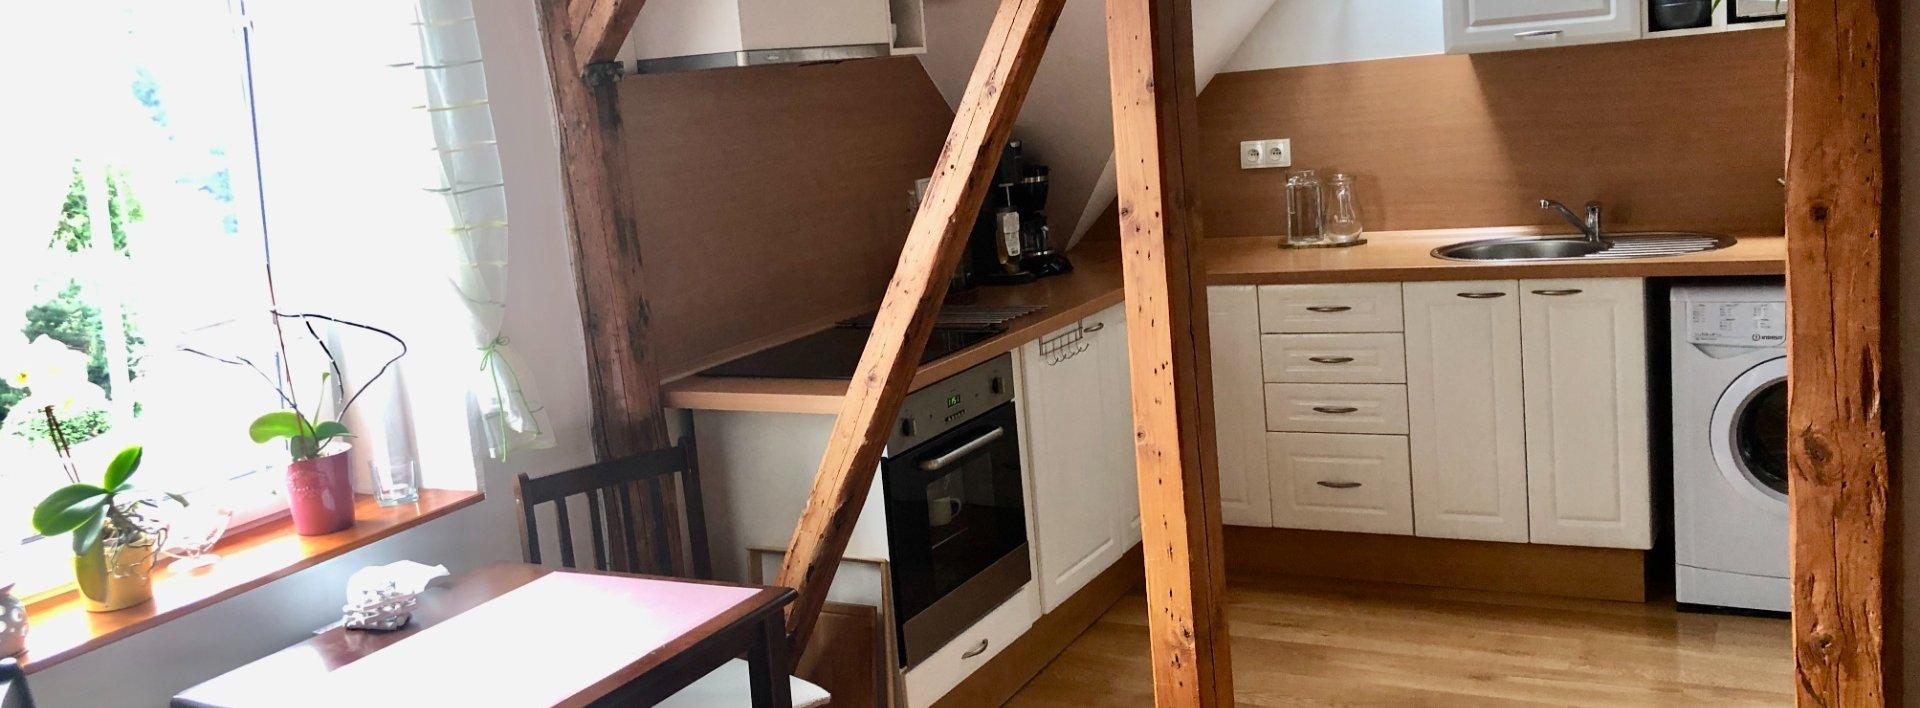 Prodej bytu 3+kk, 114 m² - Liberec XV-Starý Harcov, Ev.č.: N49090